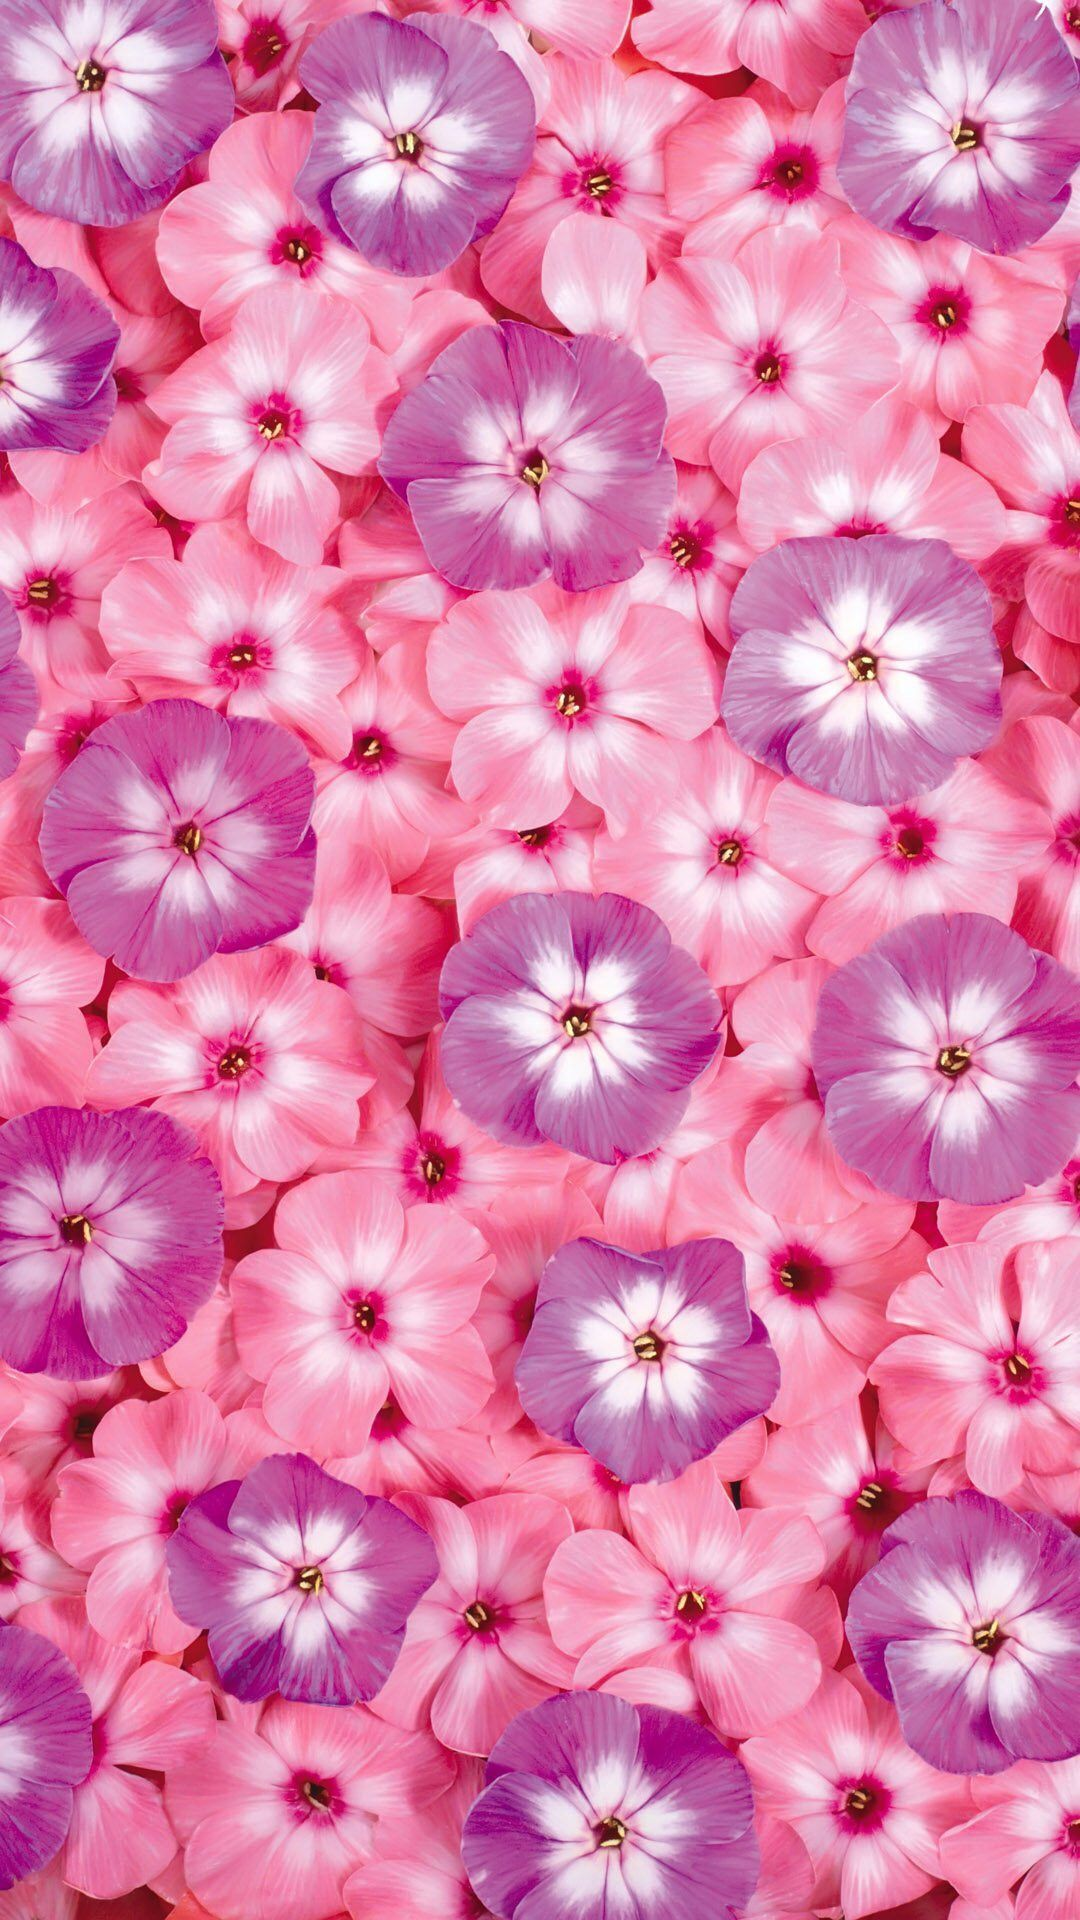 Pink, Petal, Flower, Lilac, Purple, Plant Flower iphone